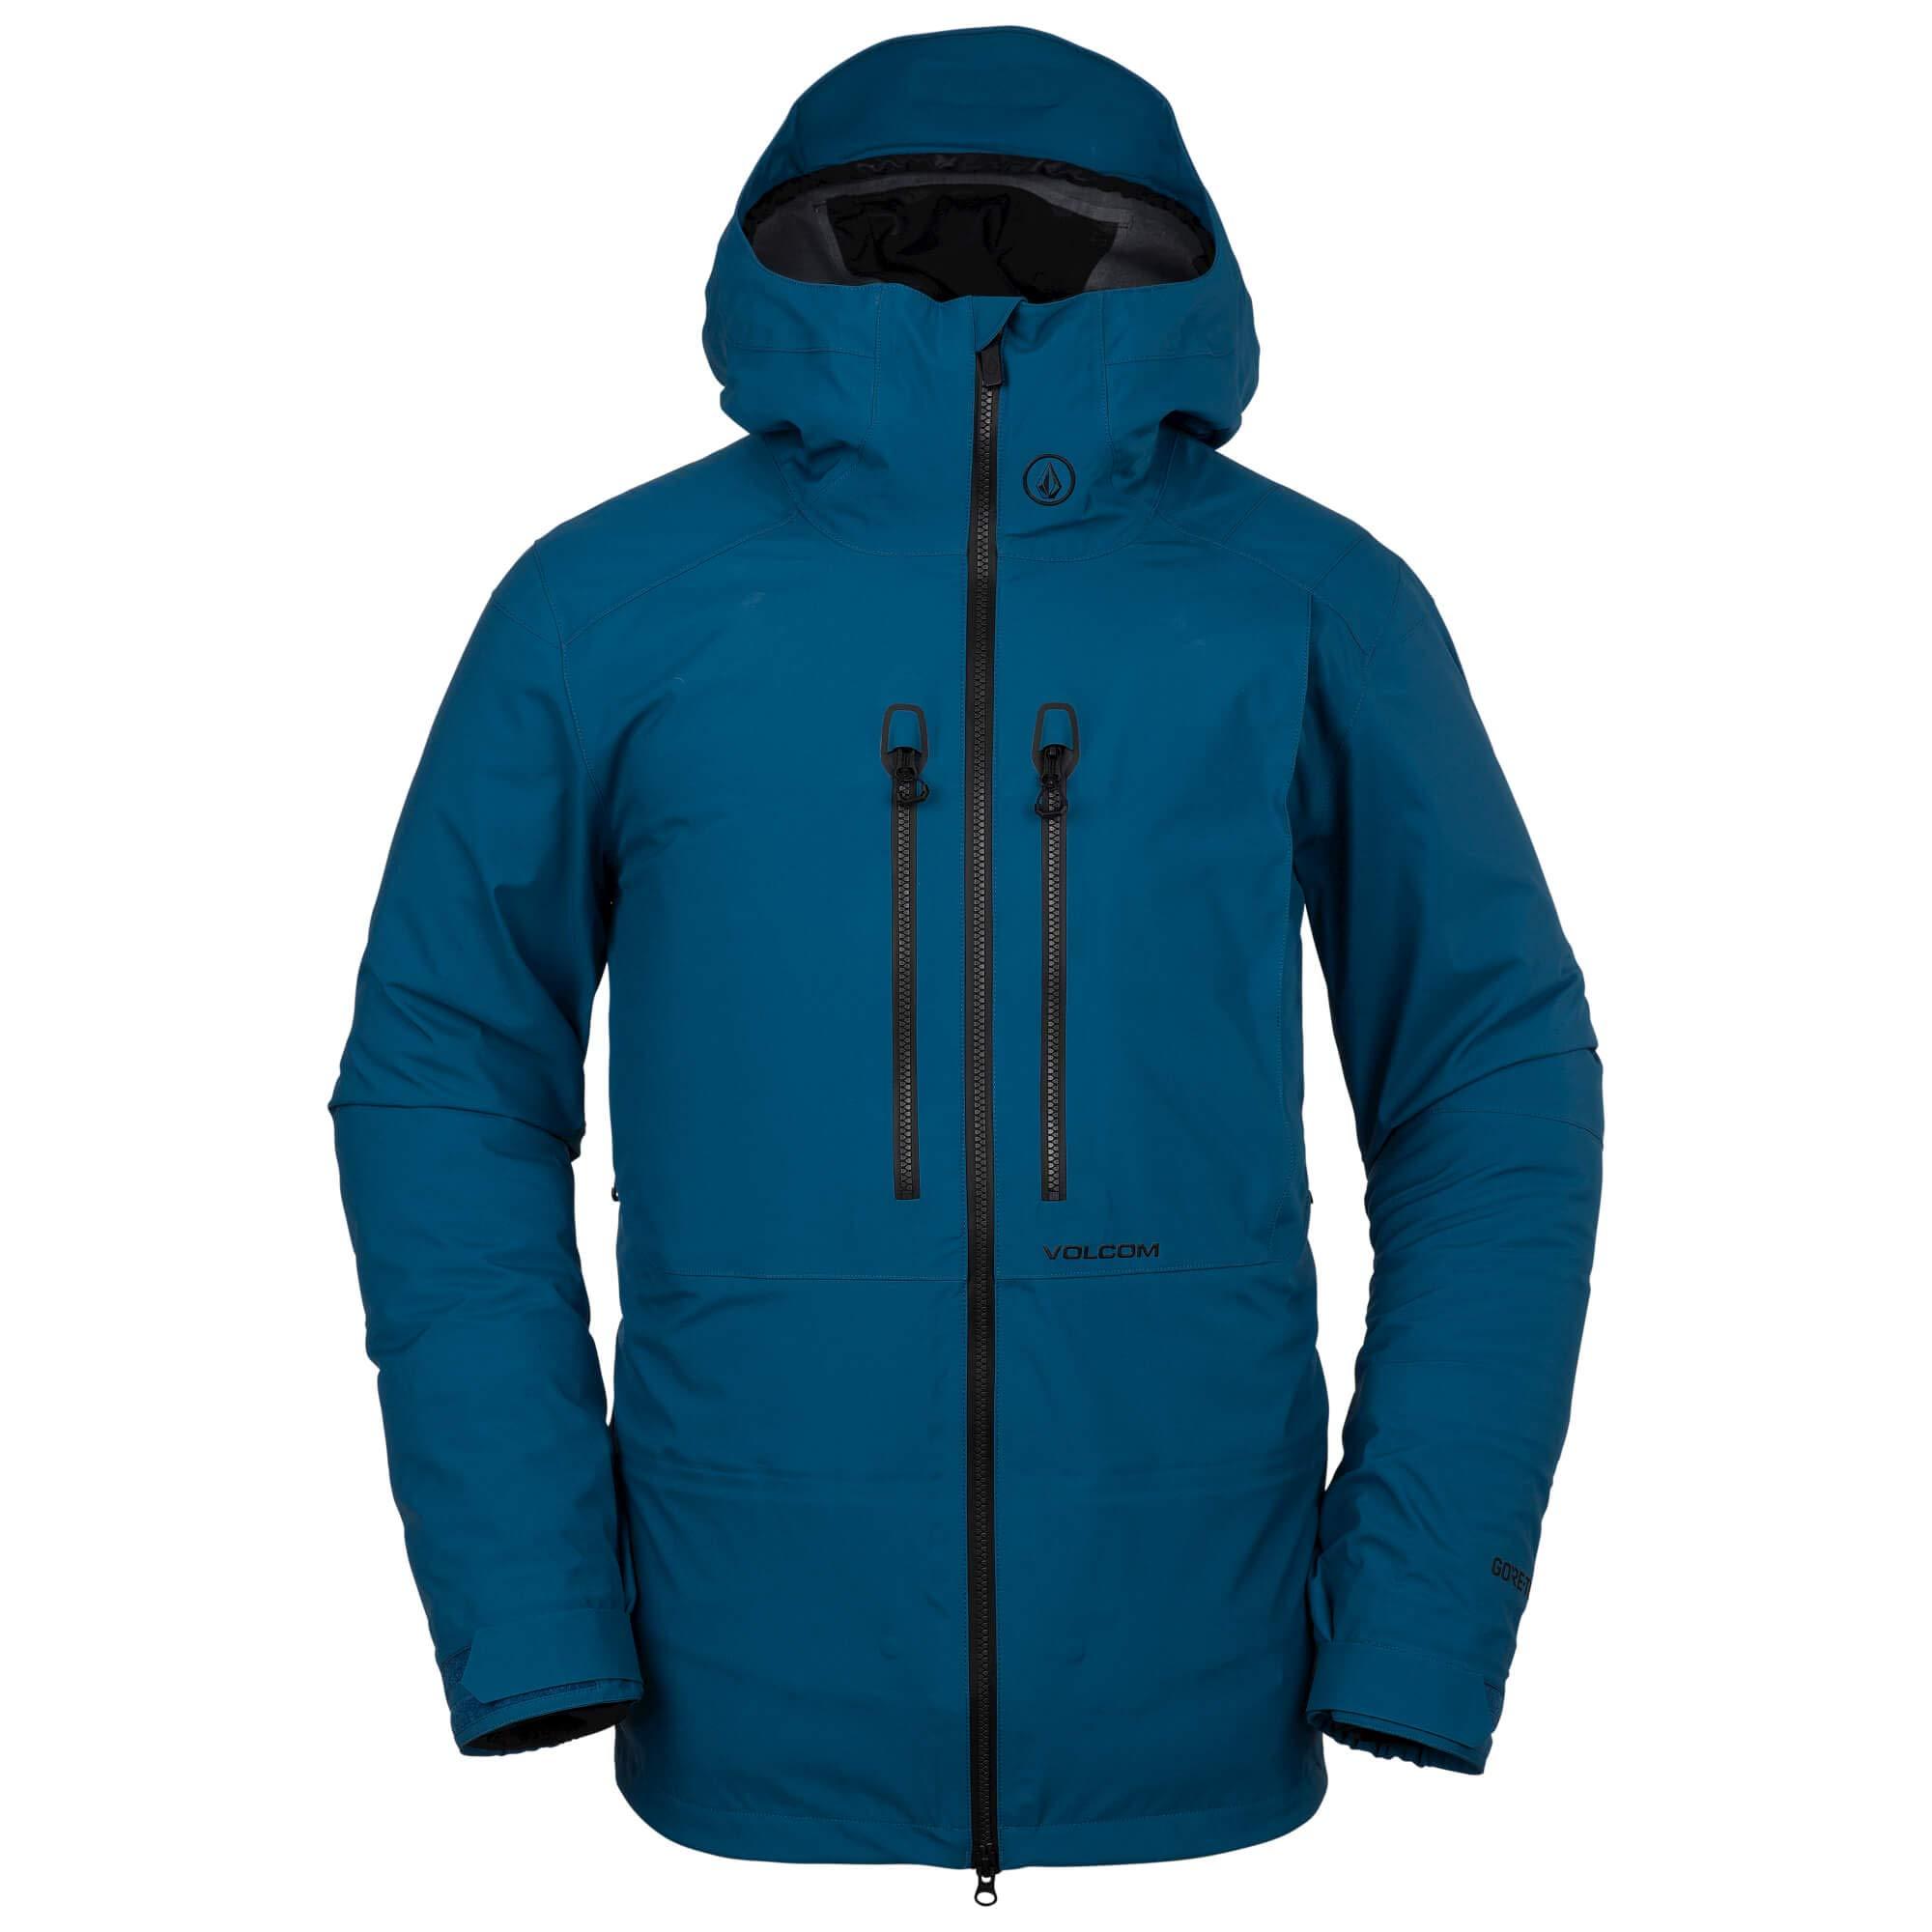 Volcom Men's Guide Gore-Tex Flannel Back Snow Jacket, Blue, Medium